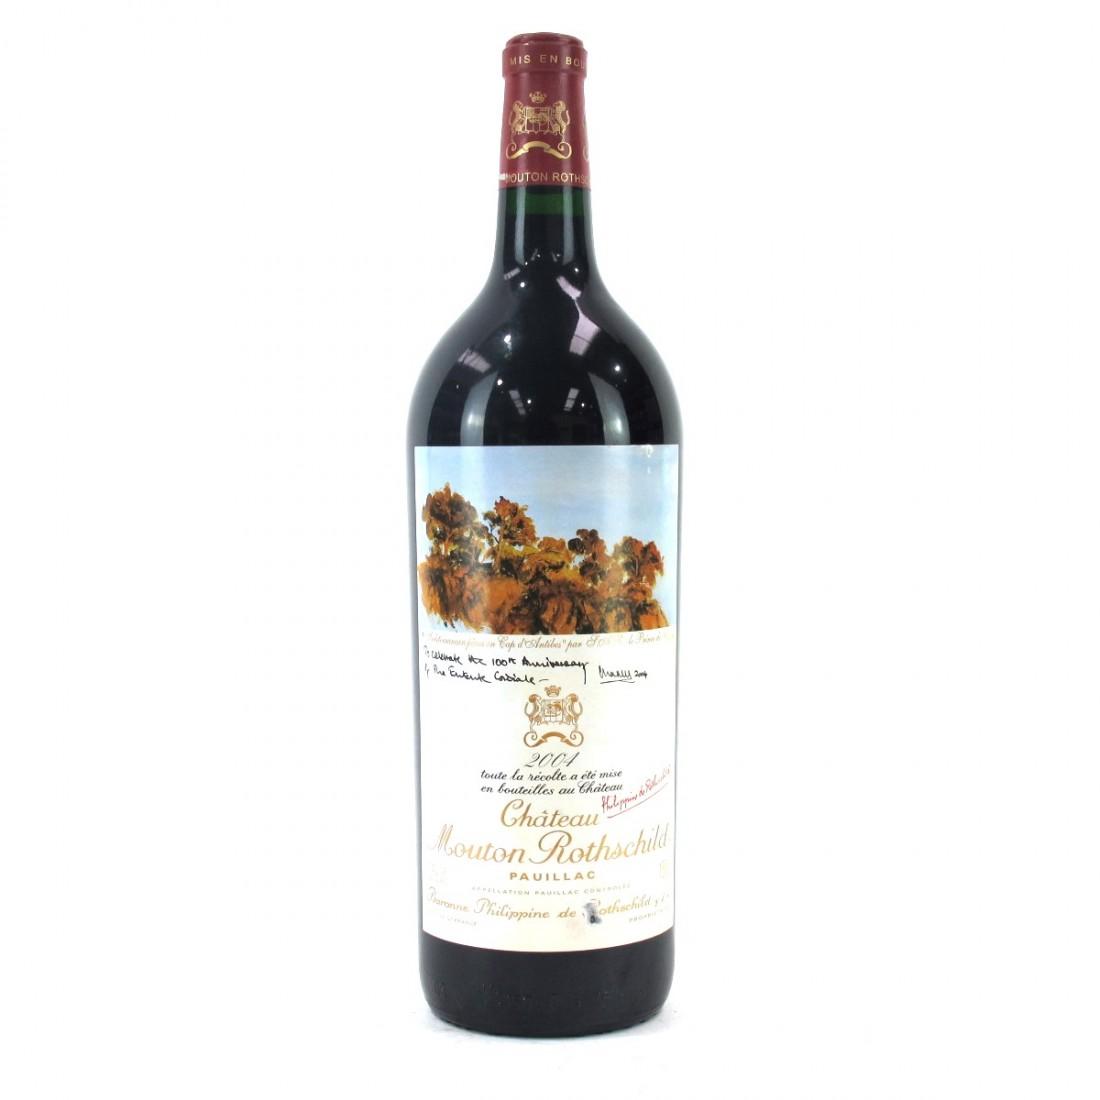 Ch. Mouton-Rothschild 2004 Pauillac 1er-Cru 150cl